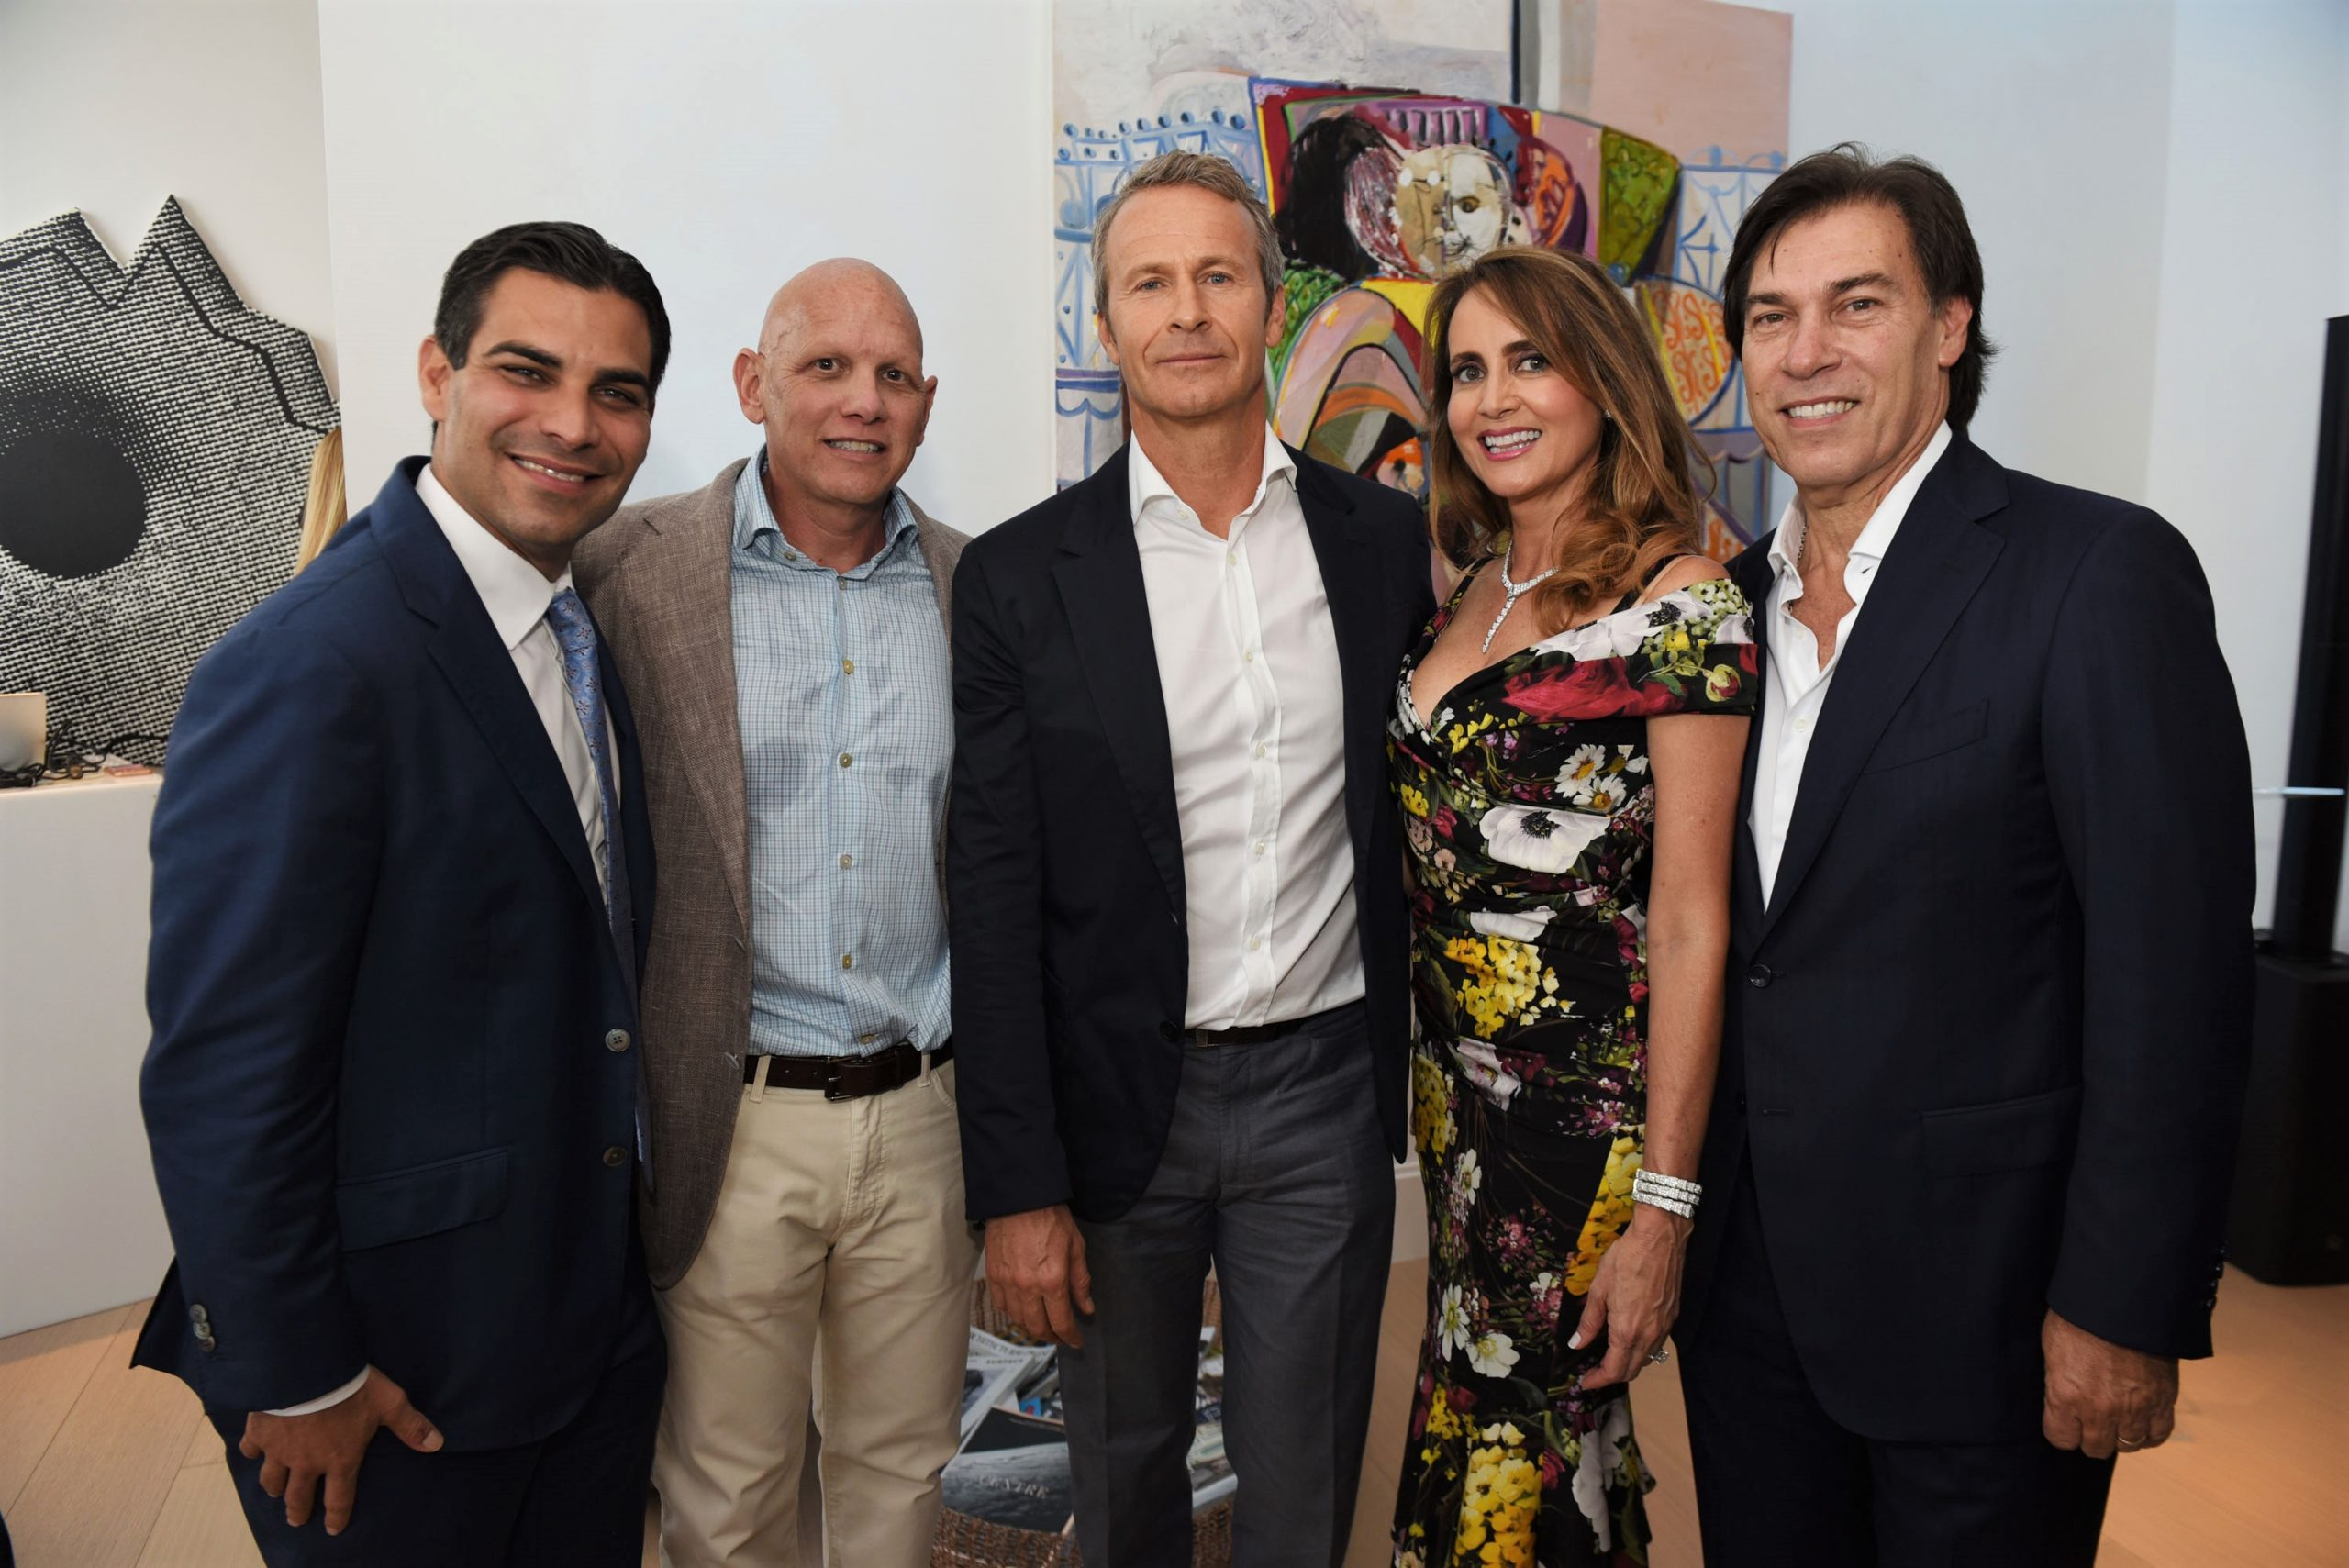 Francis Suarez, Fran Scola, Vladislav Doronin, Ana Cristina Defortuna & Edgardo Defortuna